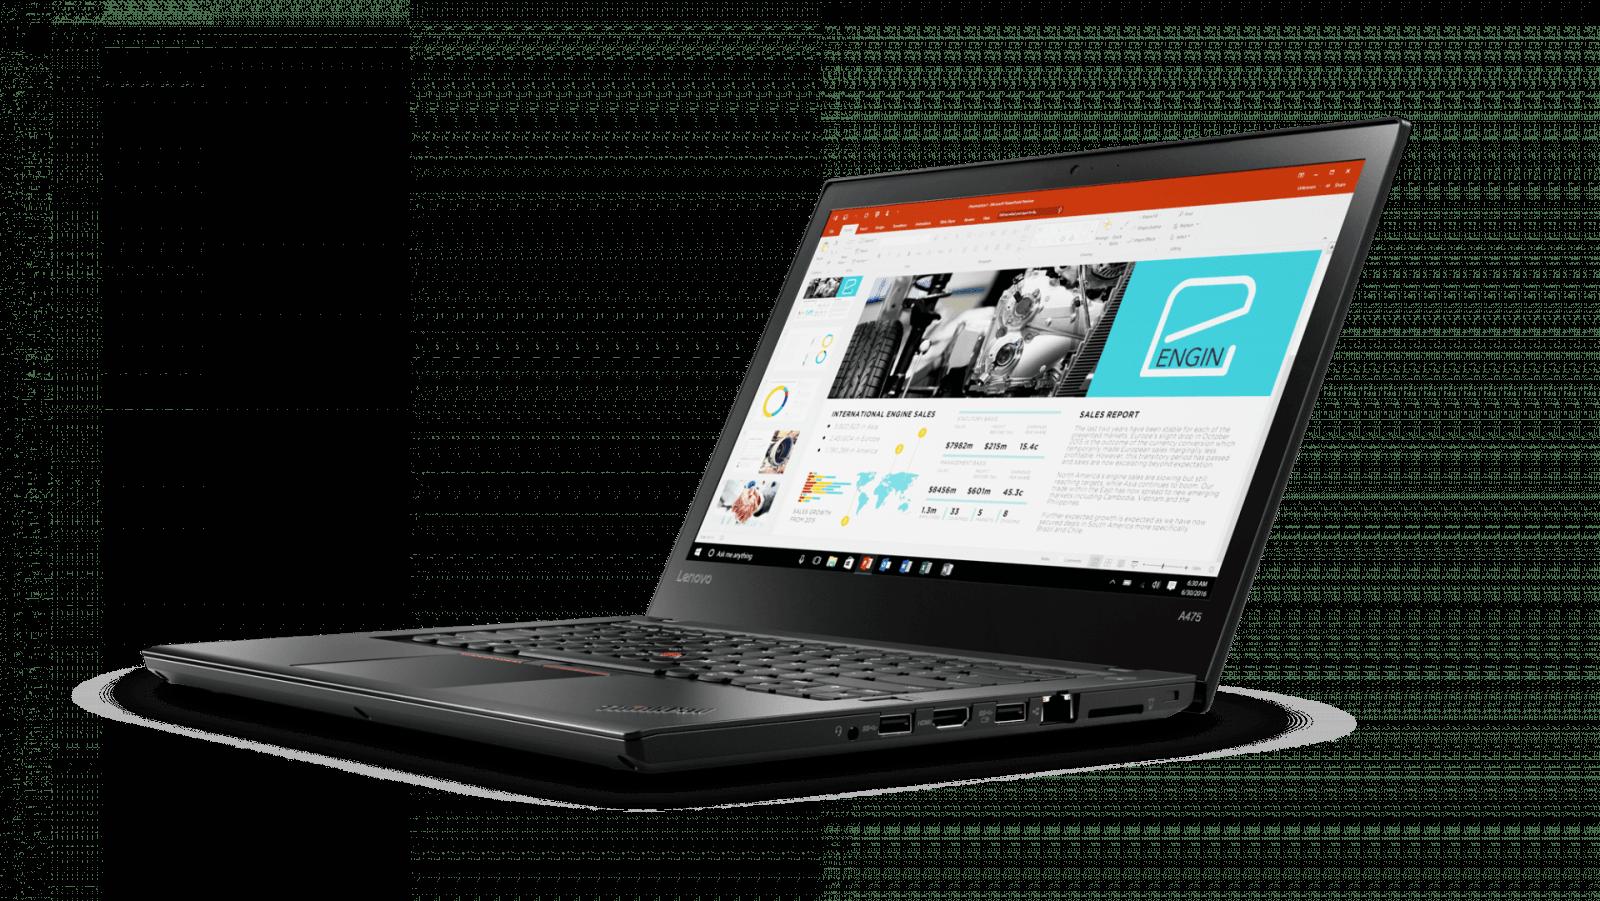 02 Thinkpad A475 14inch Hero Shot Front facing left PPT - Lenovo выпустила ноутбуки ThinkPad на процессорах AMD PRO